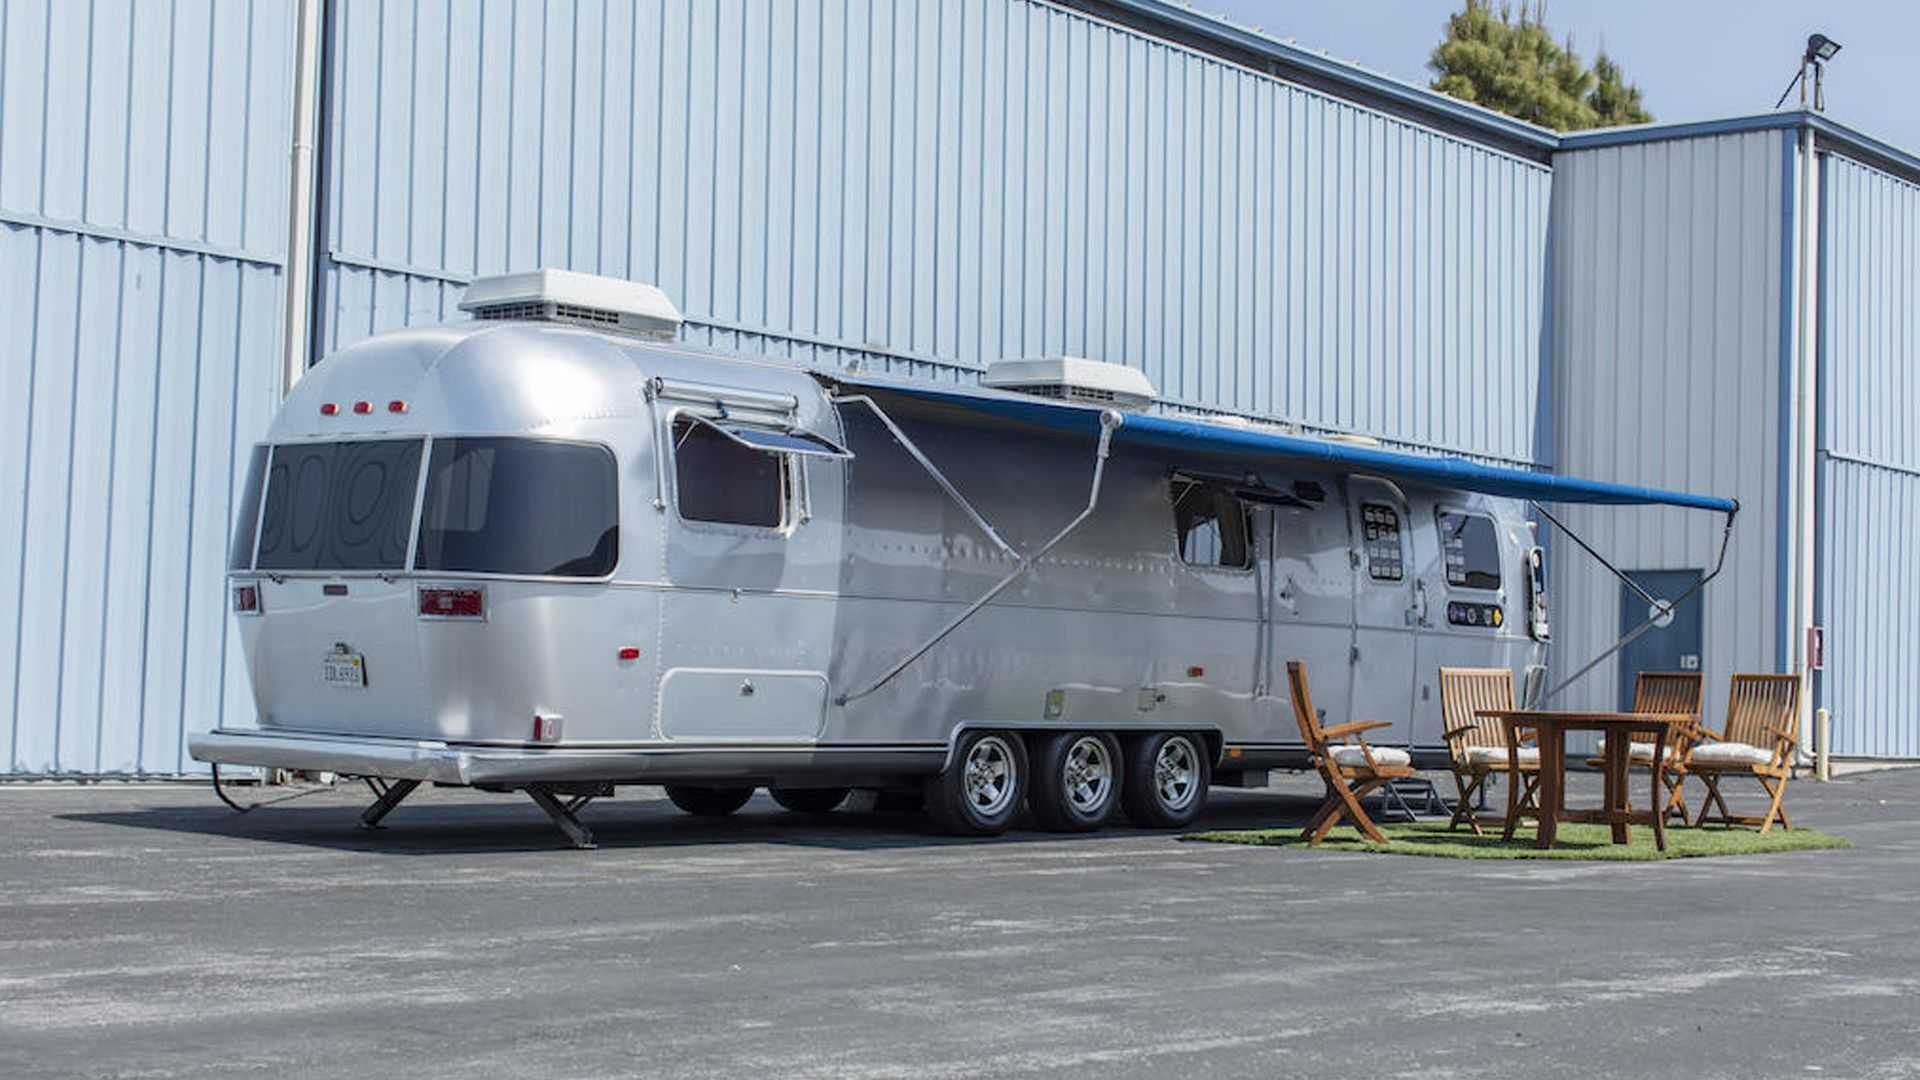 Tom-Hanks-Airstream-trailer-for-sale-1